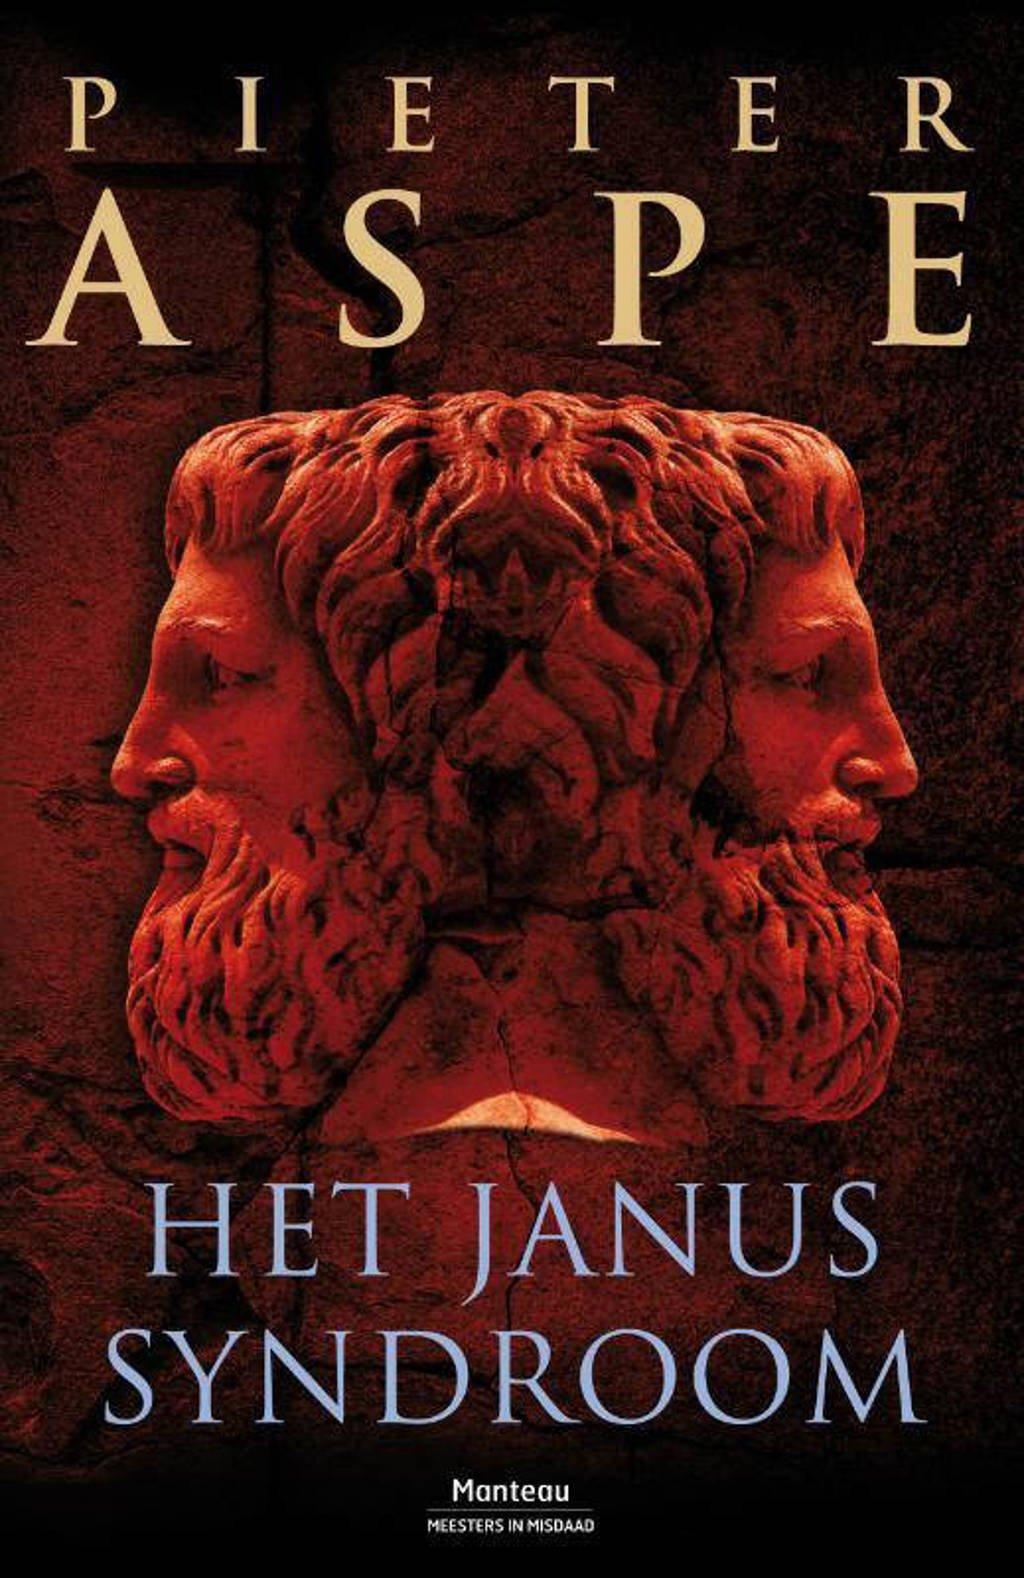 Het Janussyndroom - Pieter Aspe